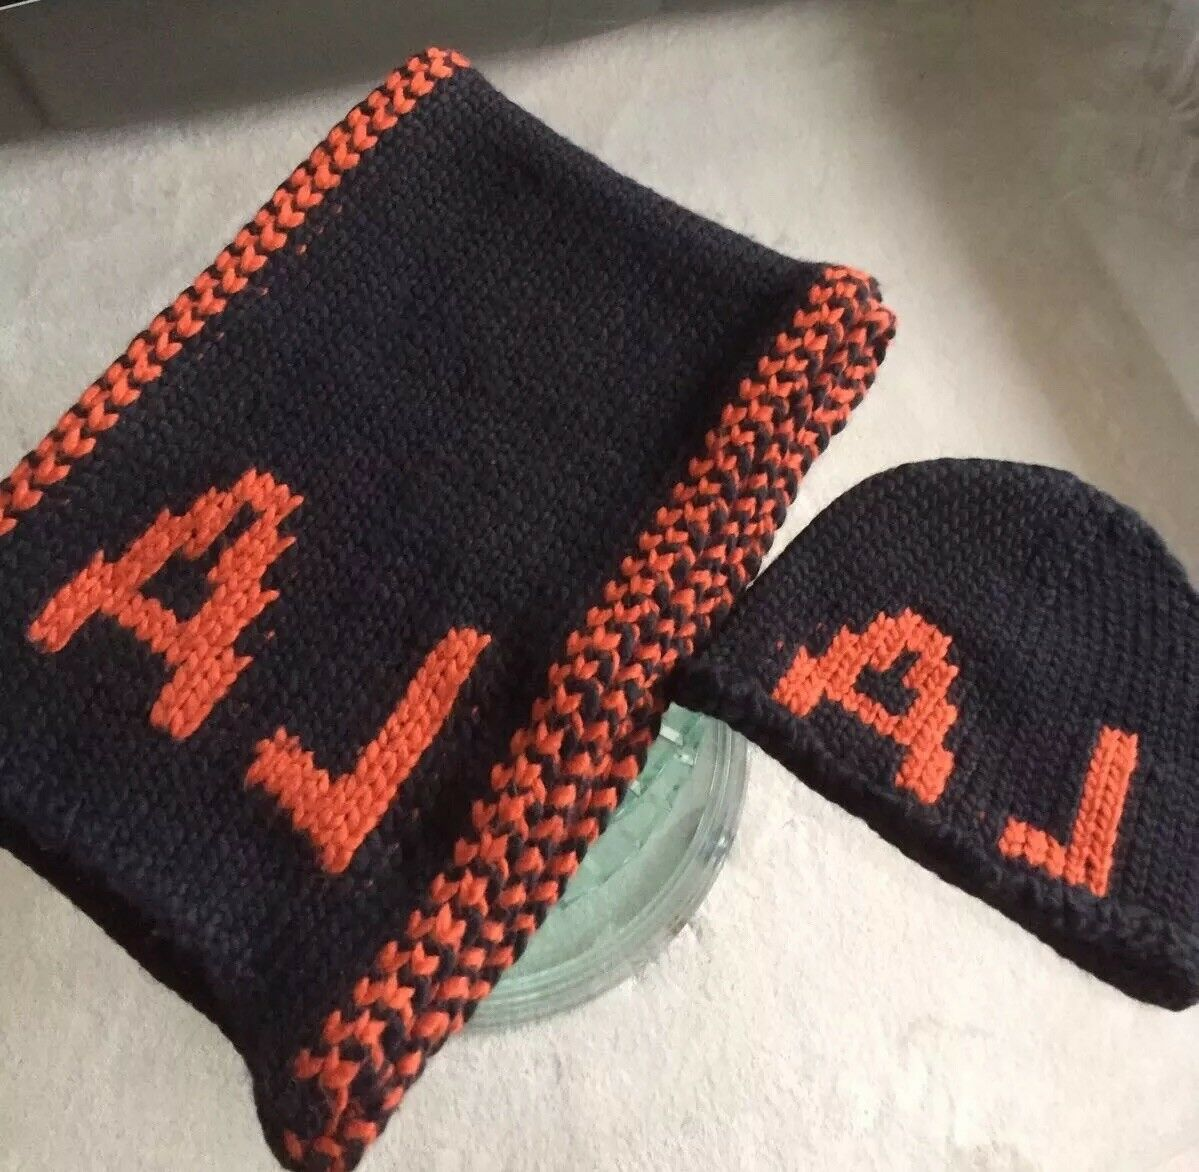 Armani Jeans Black/Orange Hat and Scarf Set (Brand New)